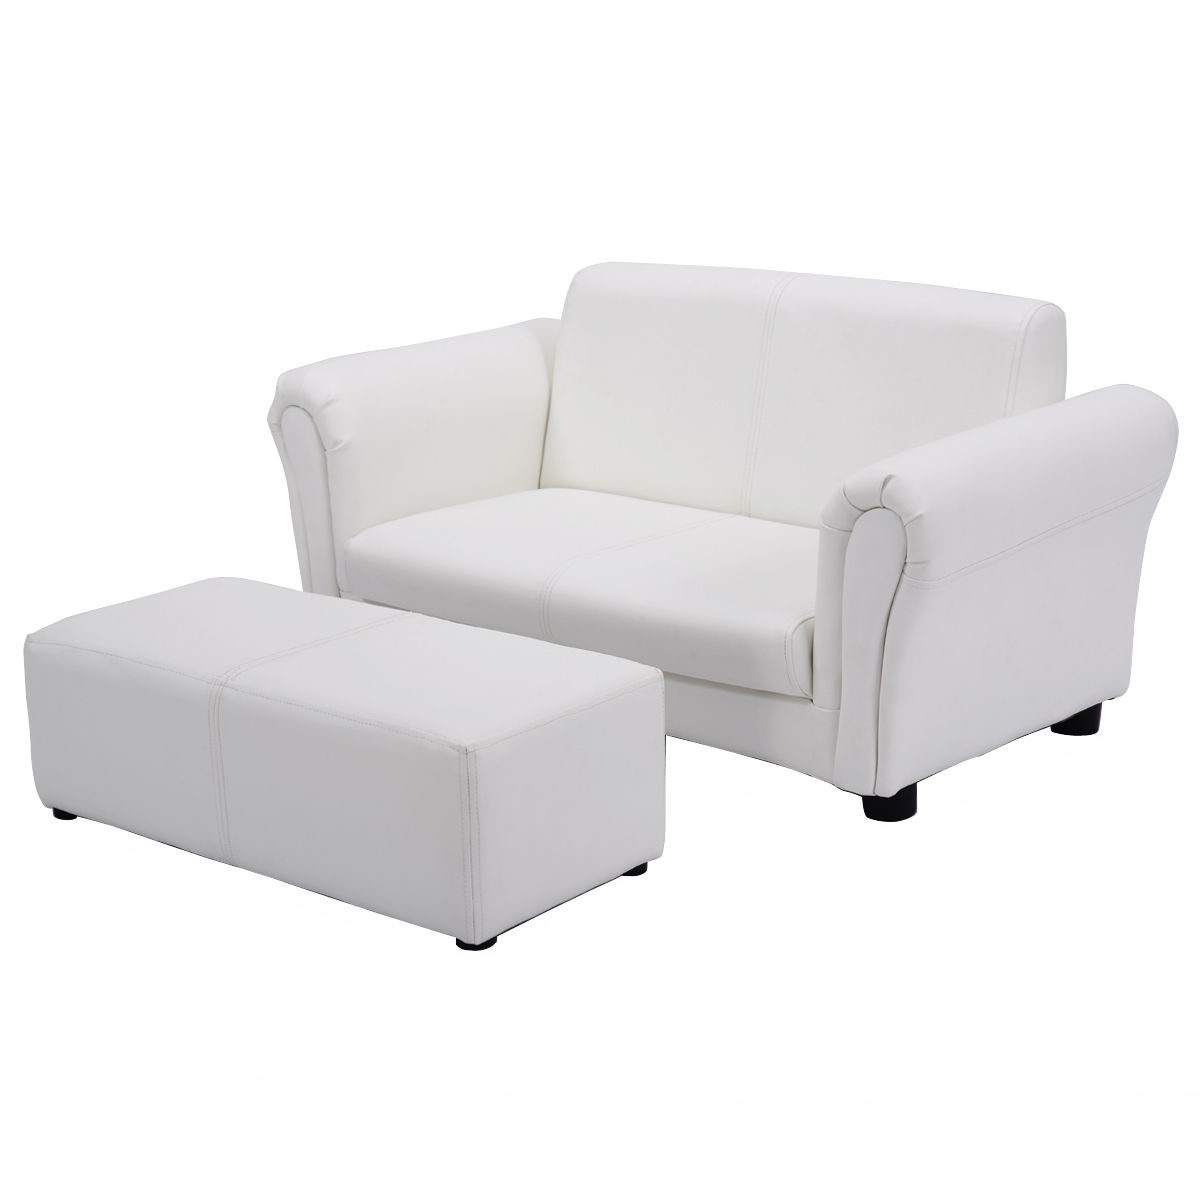 Costway White Kids Sofa Armrest Chair Couch Lounge Children Birthday Gift W/ Ottoman